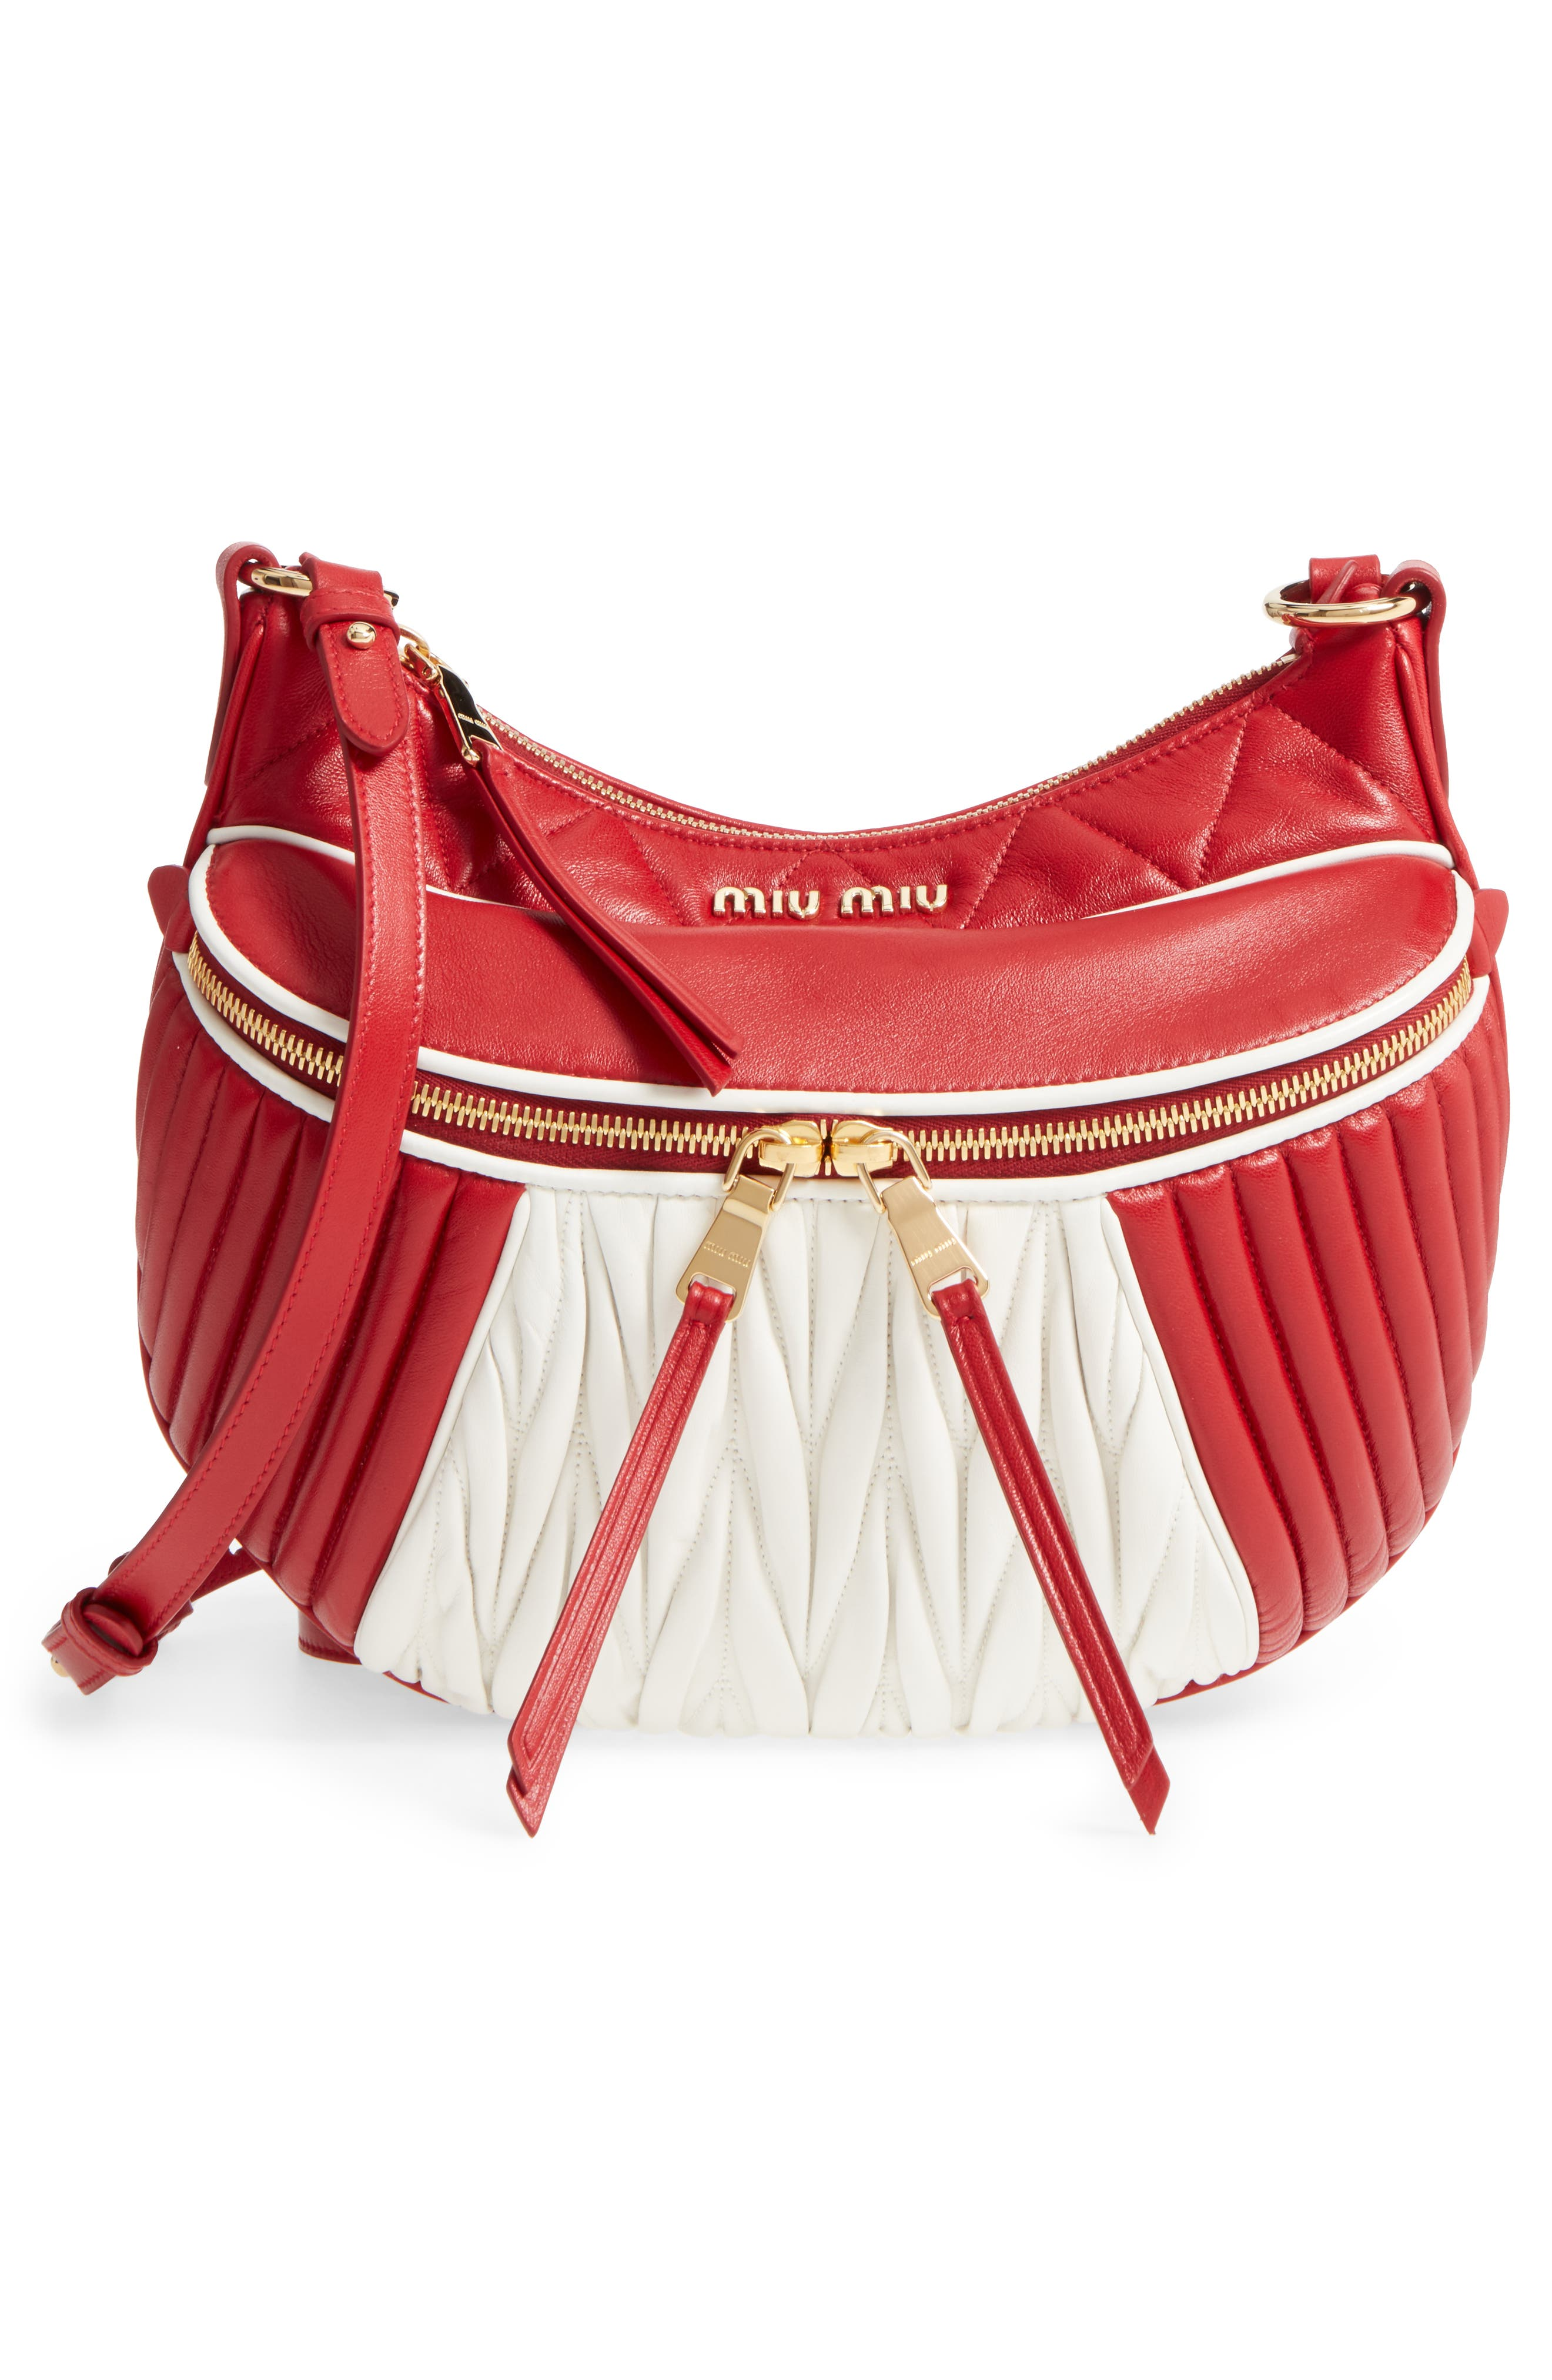 Small Rider Matelassé Leather Shoulder Bag,                             Alternate thumbnail 5, color,                             Fuoco/ Bianco